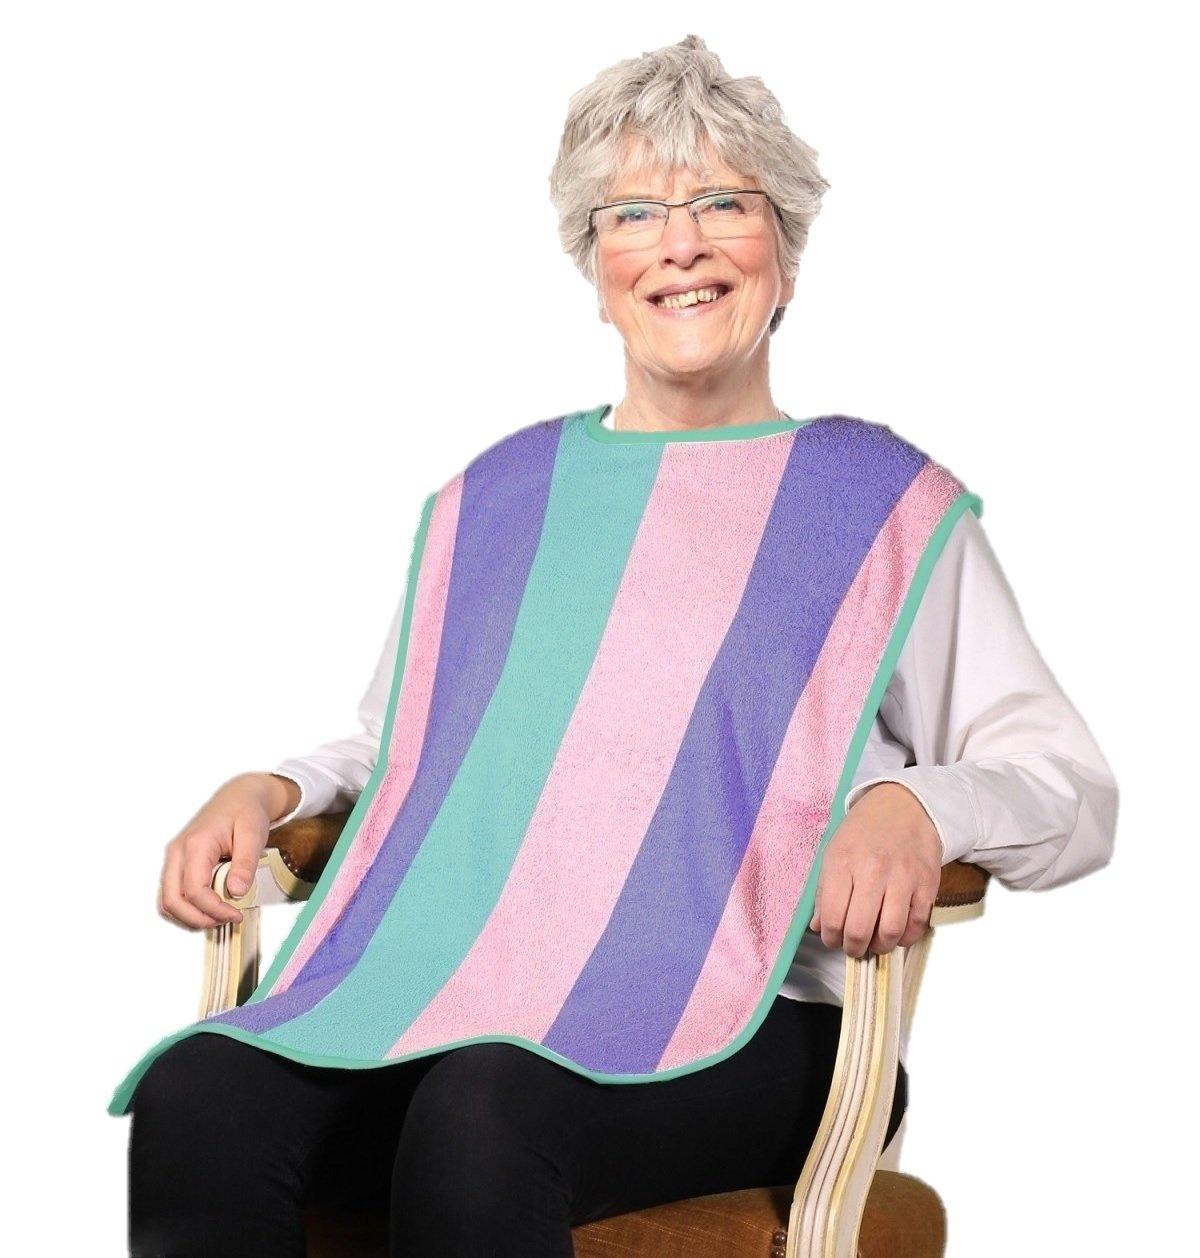 Deluxe Adult Terry Cloth Long Bibs - 3PK Rainbow by BELLA KLINE DESIGN